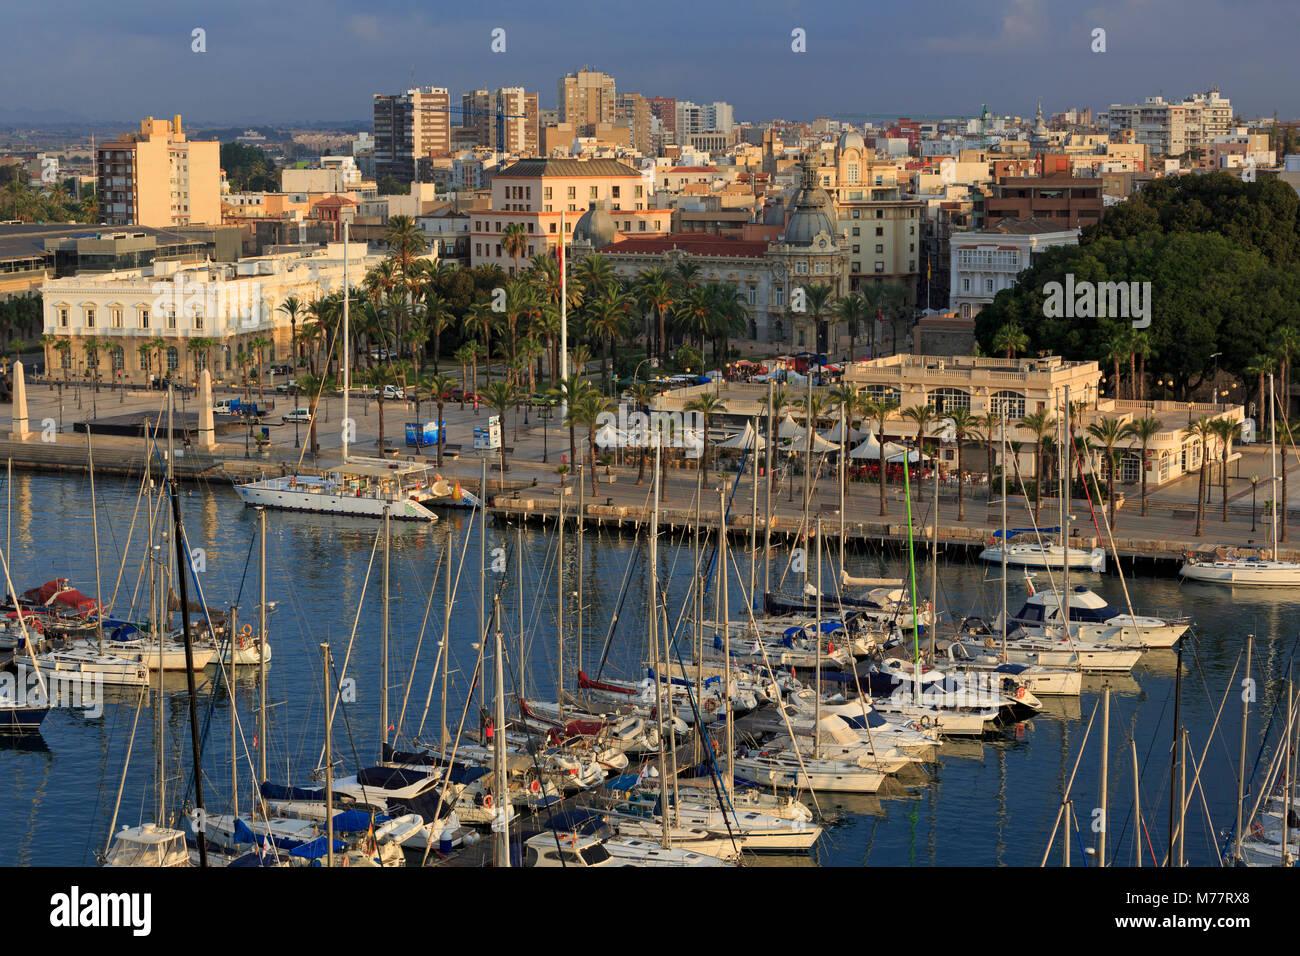 Marina, Cartagena Port, Murcia, Spain, Europe - Stock Image